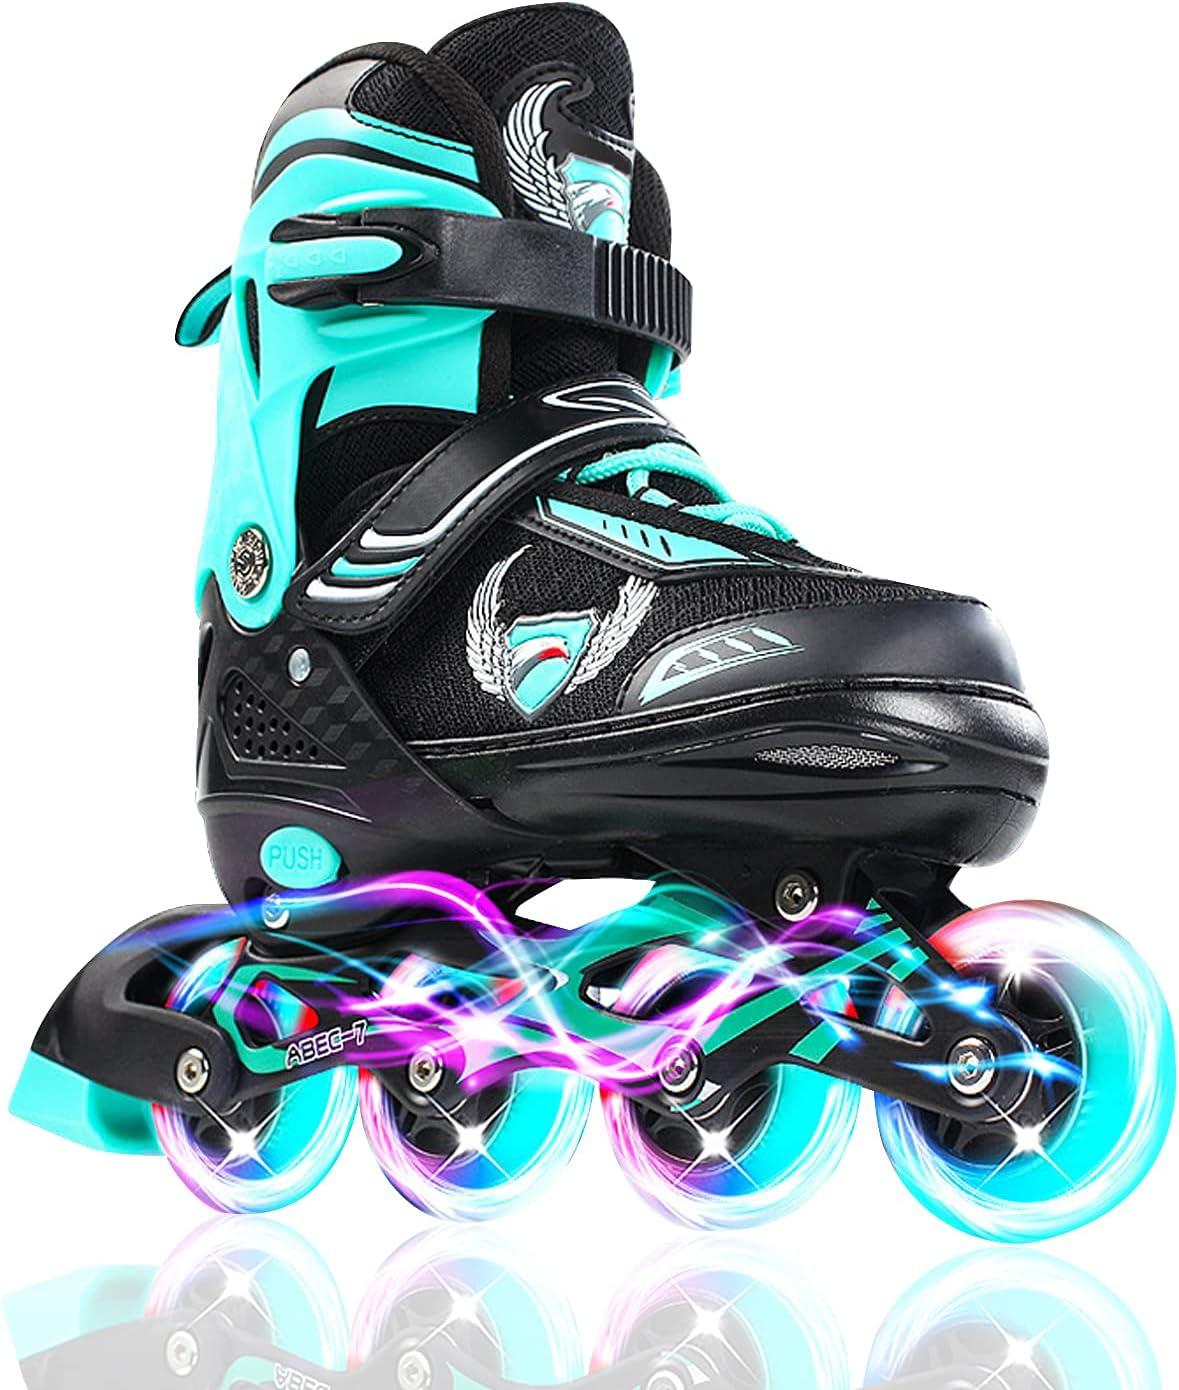 KDJ Max 40% OFF Adjustable Inline Skates for sold out Boys Kids Rolle Beginners Girls